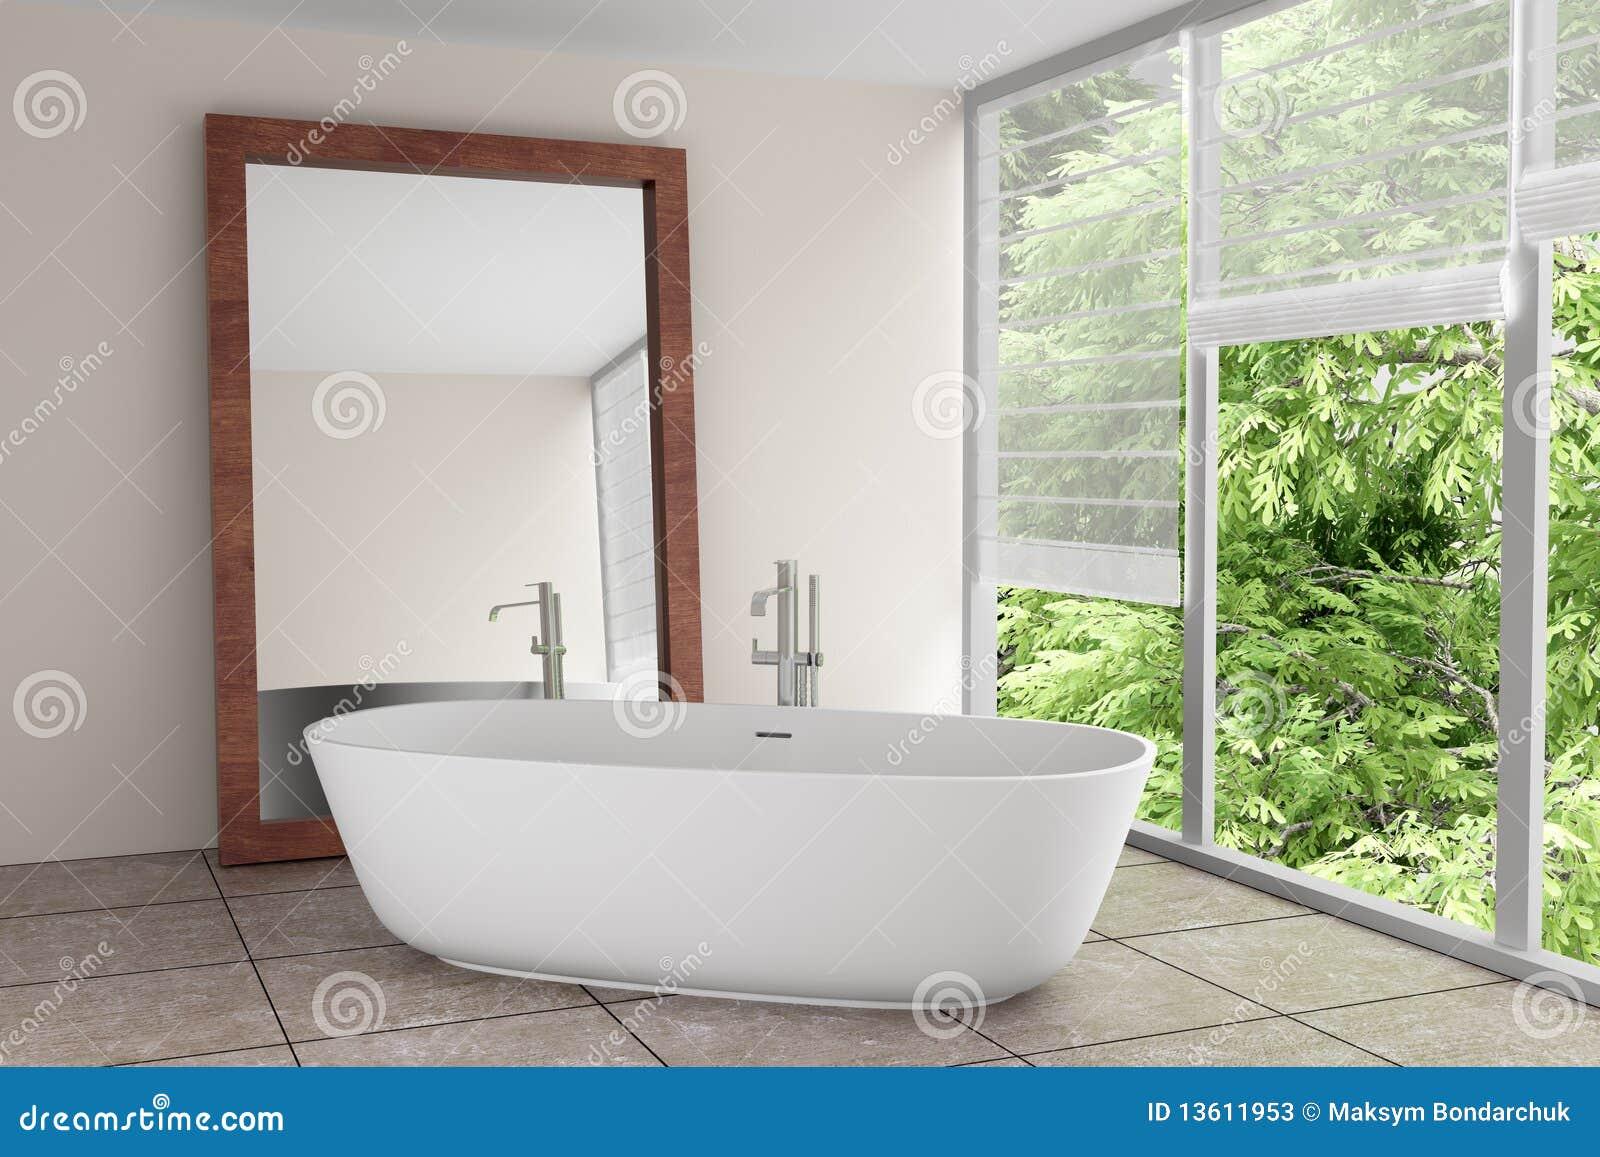 Moderne Badkamer Spiegel: Moderne badkamer voorbeelden.